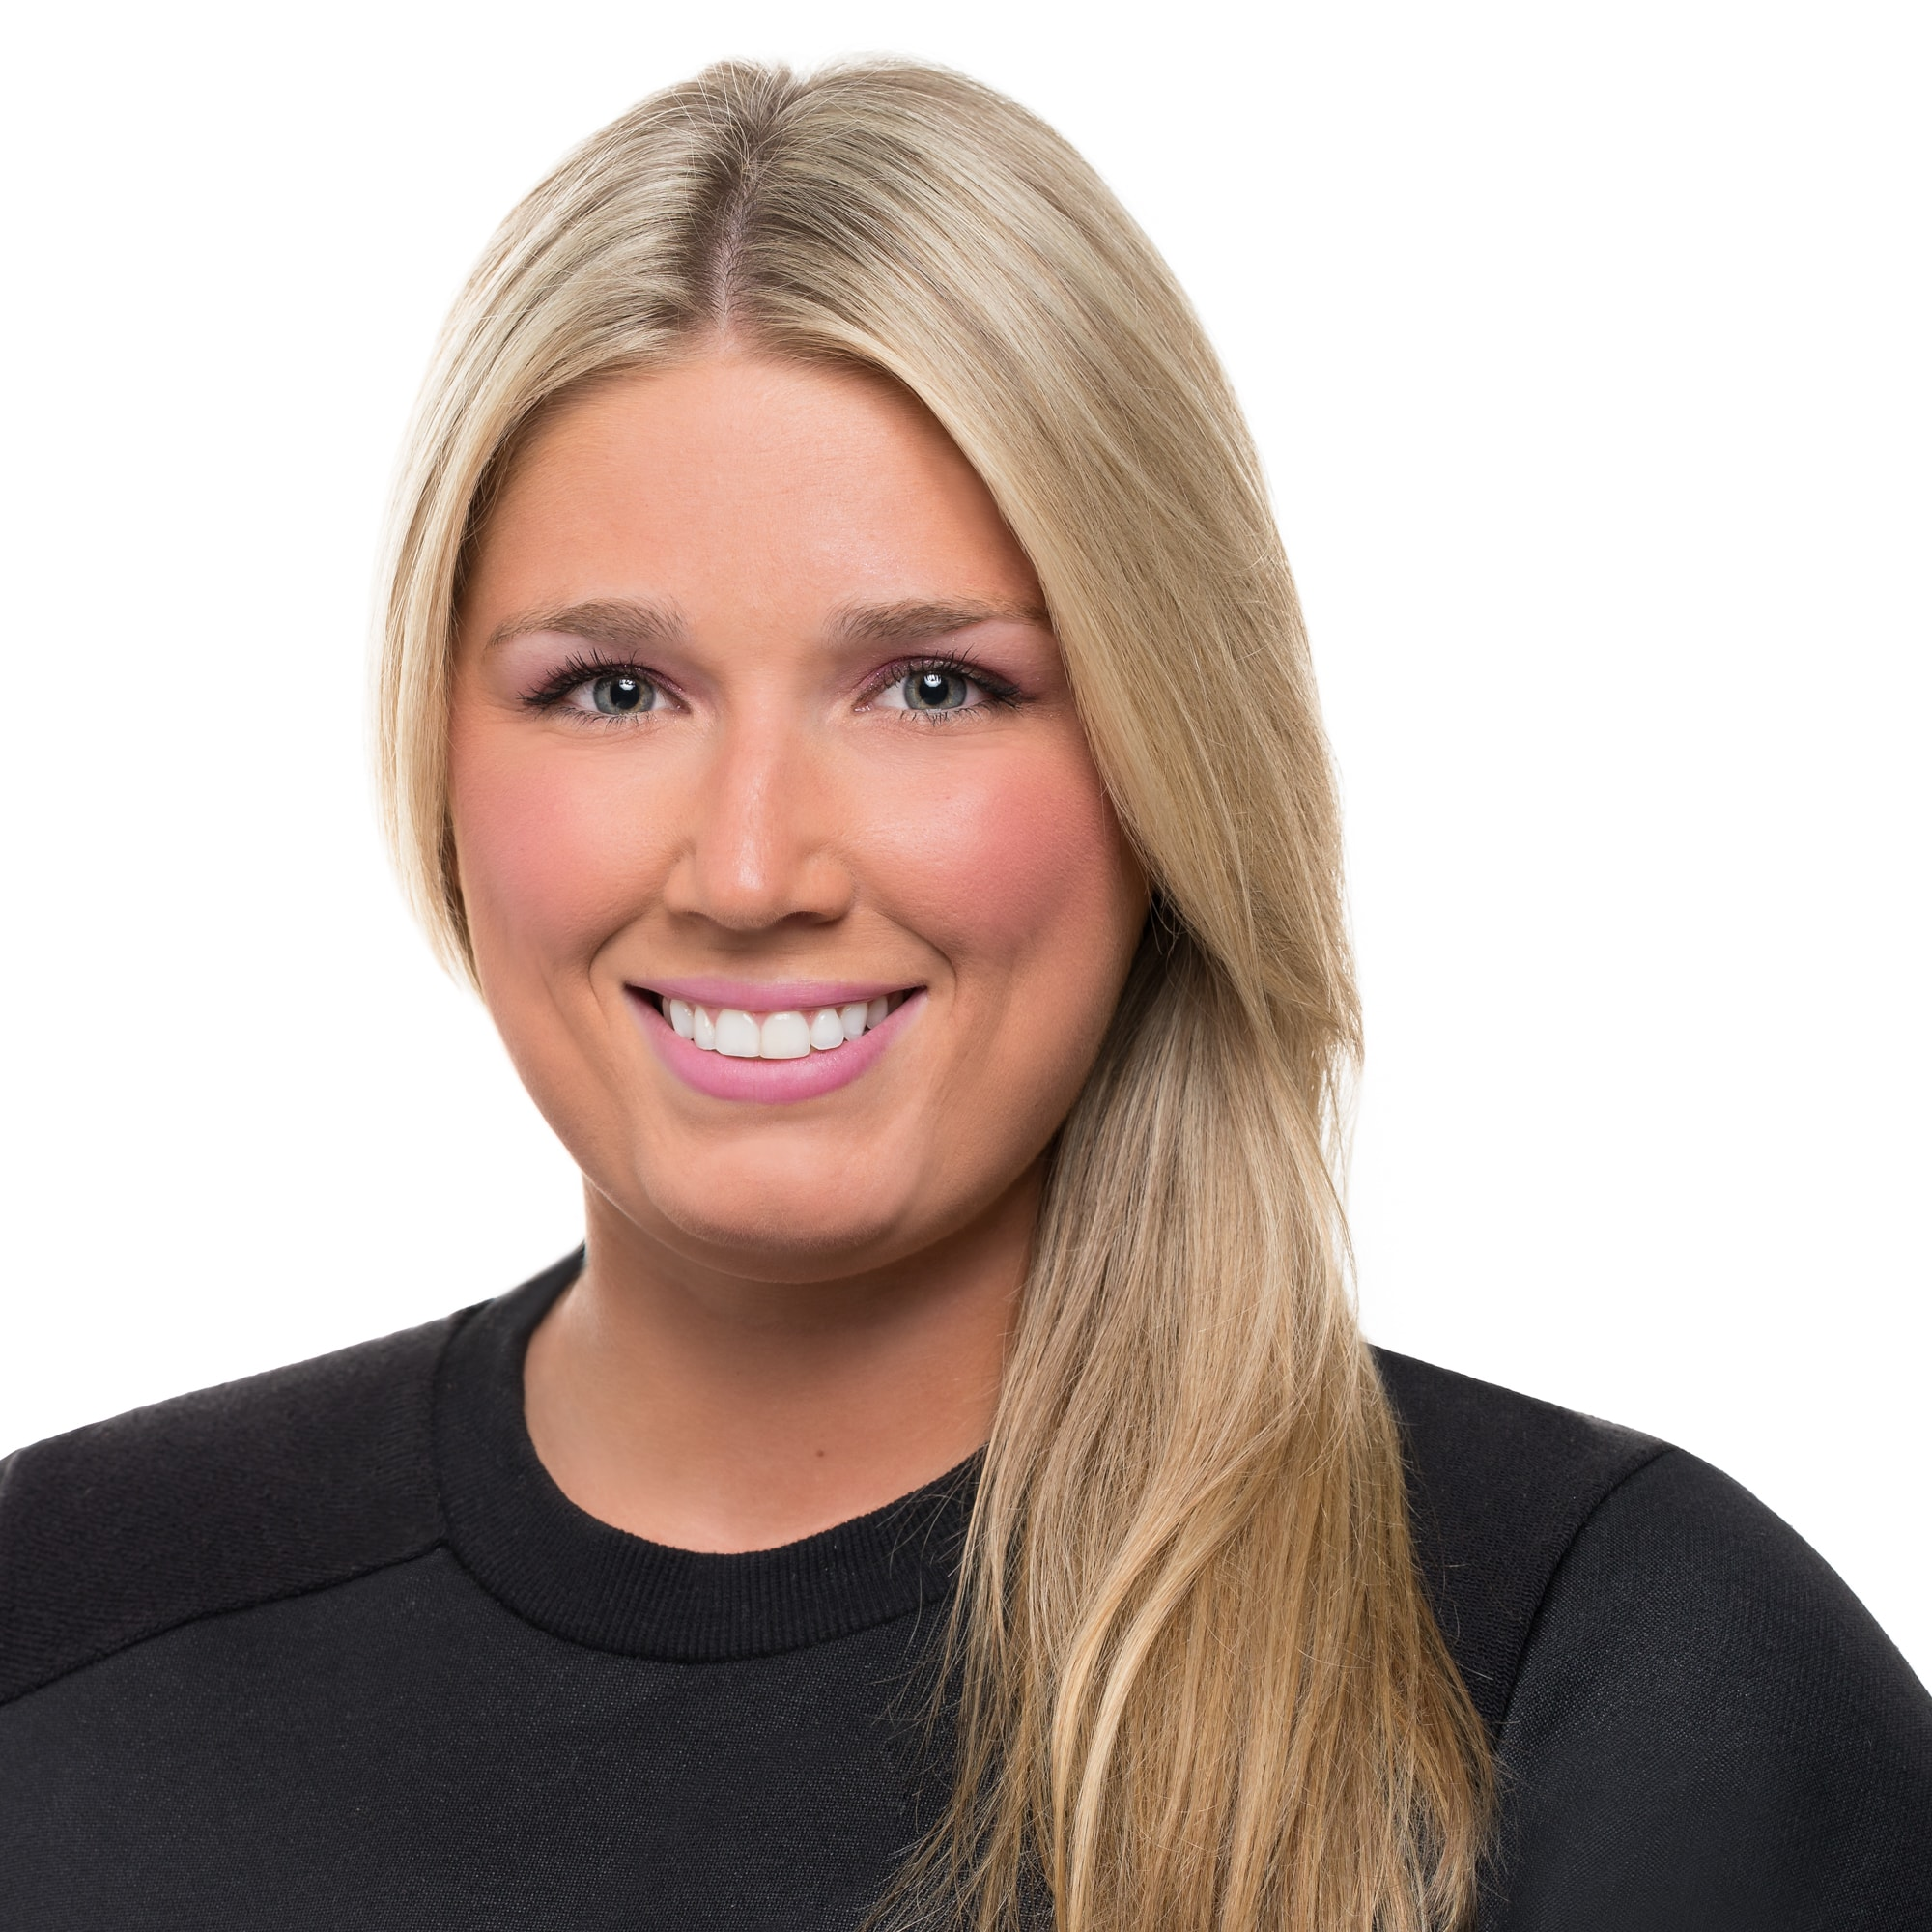 Brittany Godwin